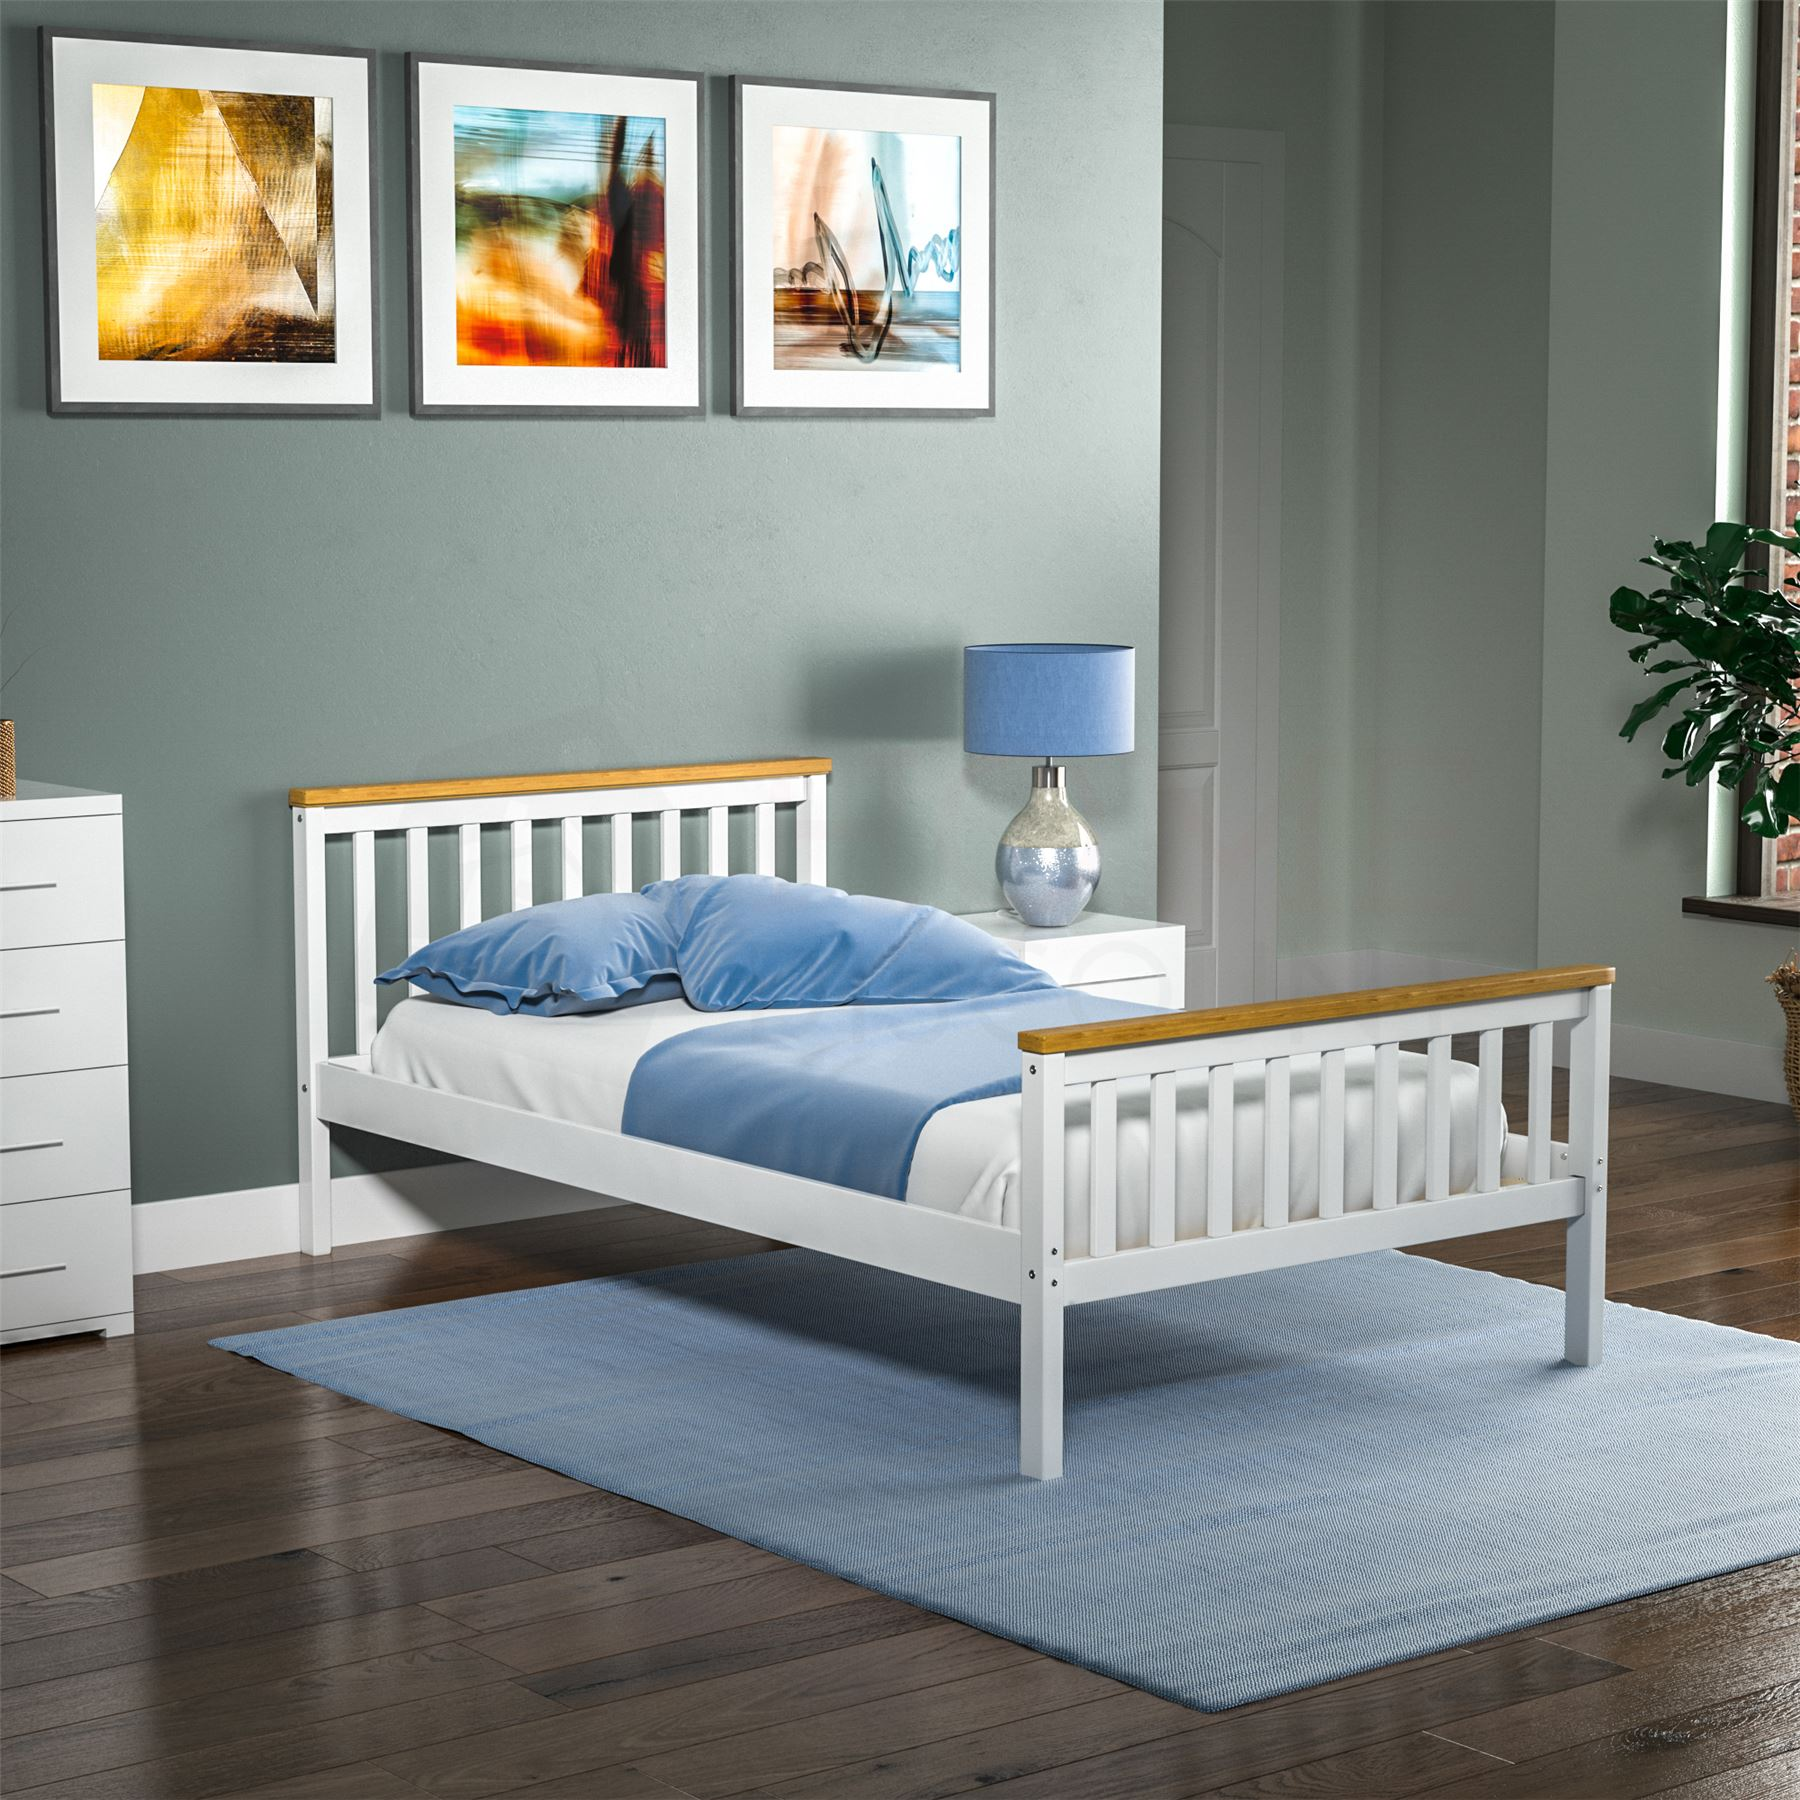 Wood bed single 3ft mattress frame slat milan bedroom - White and pine bedroom furniture ...